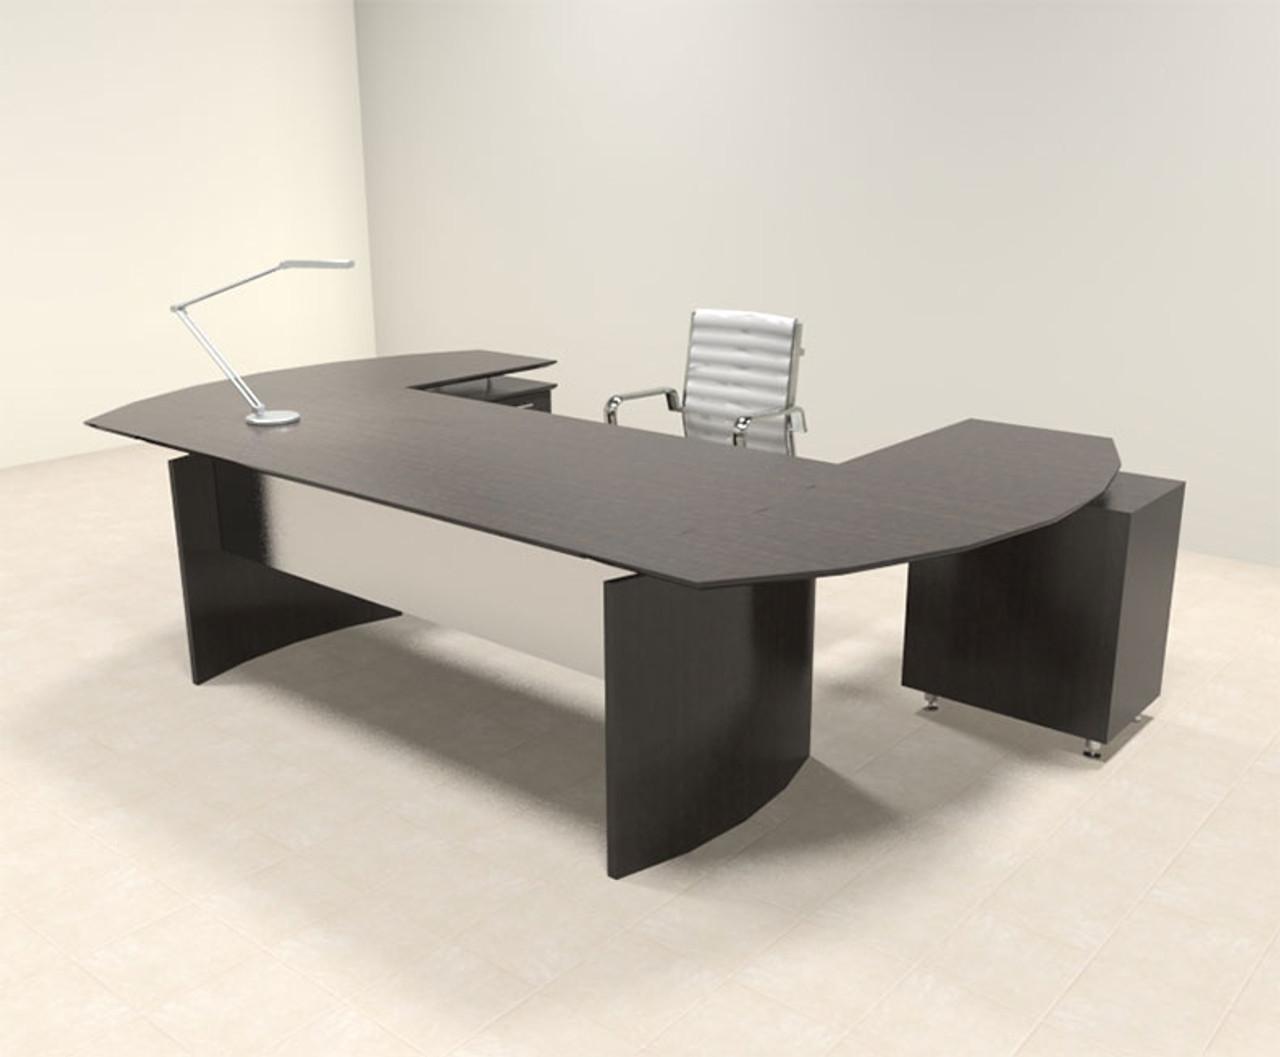 3pc Modern Contemporary U Shaped Executive Office Desk Set, #MT-MED-O9